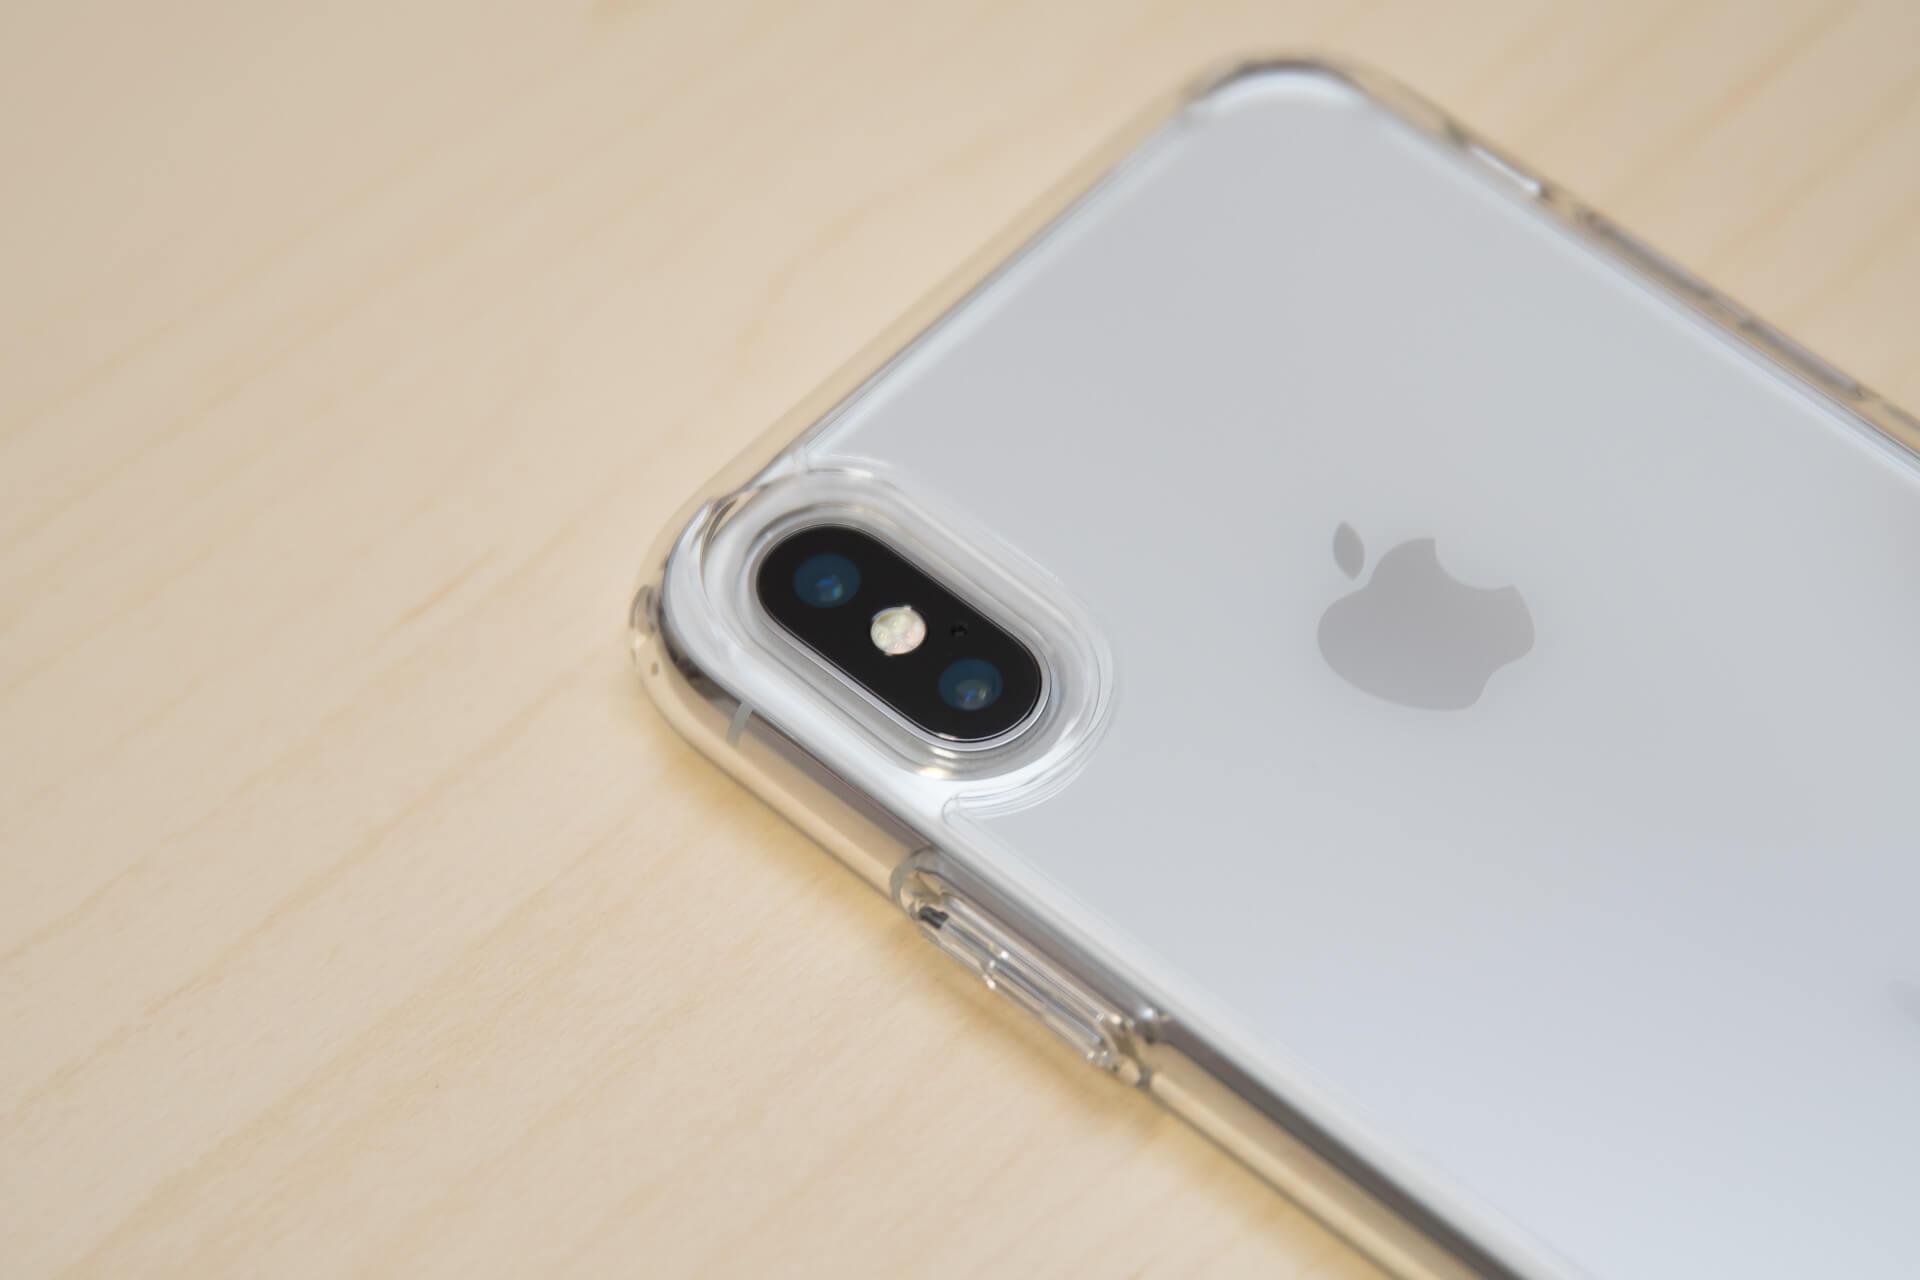 Spigen iPhone X ケース ウルトラ・ハイブリッド 5